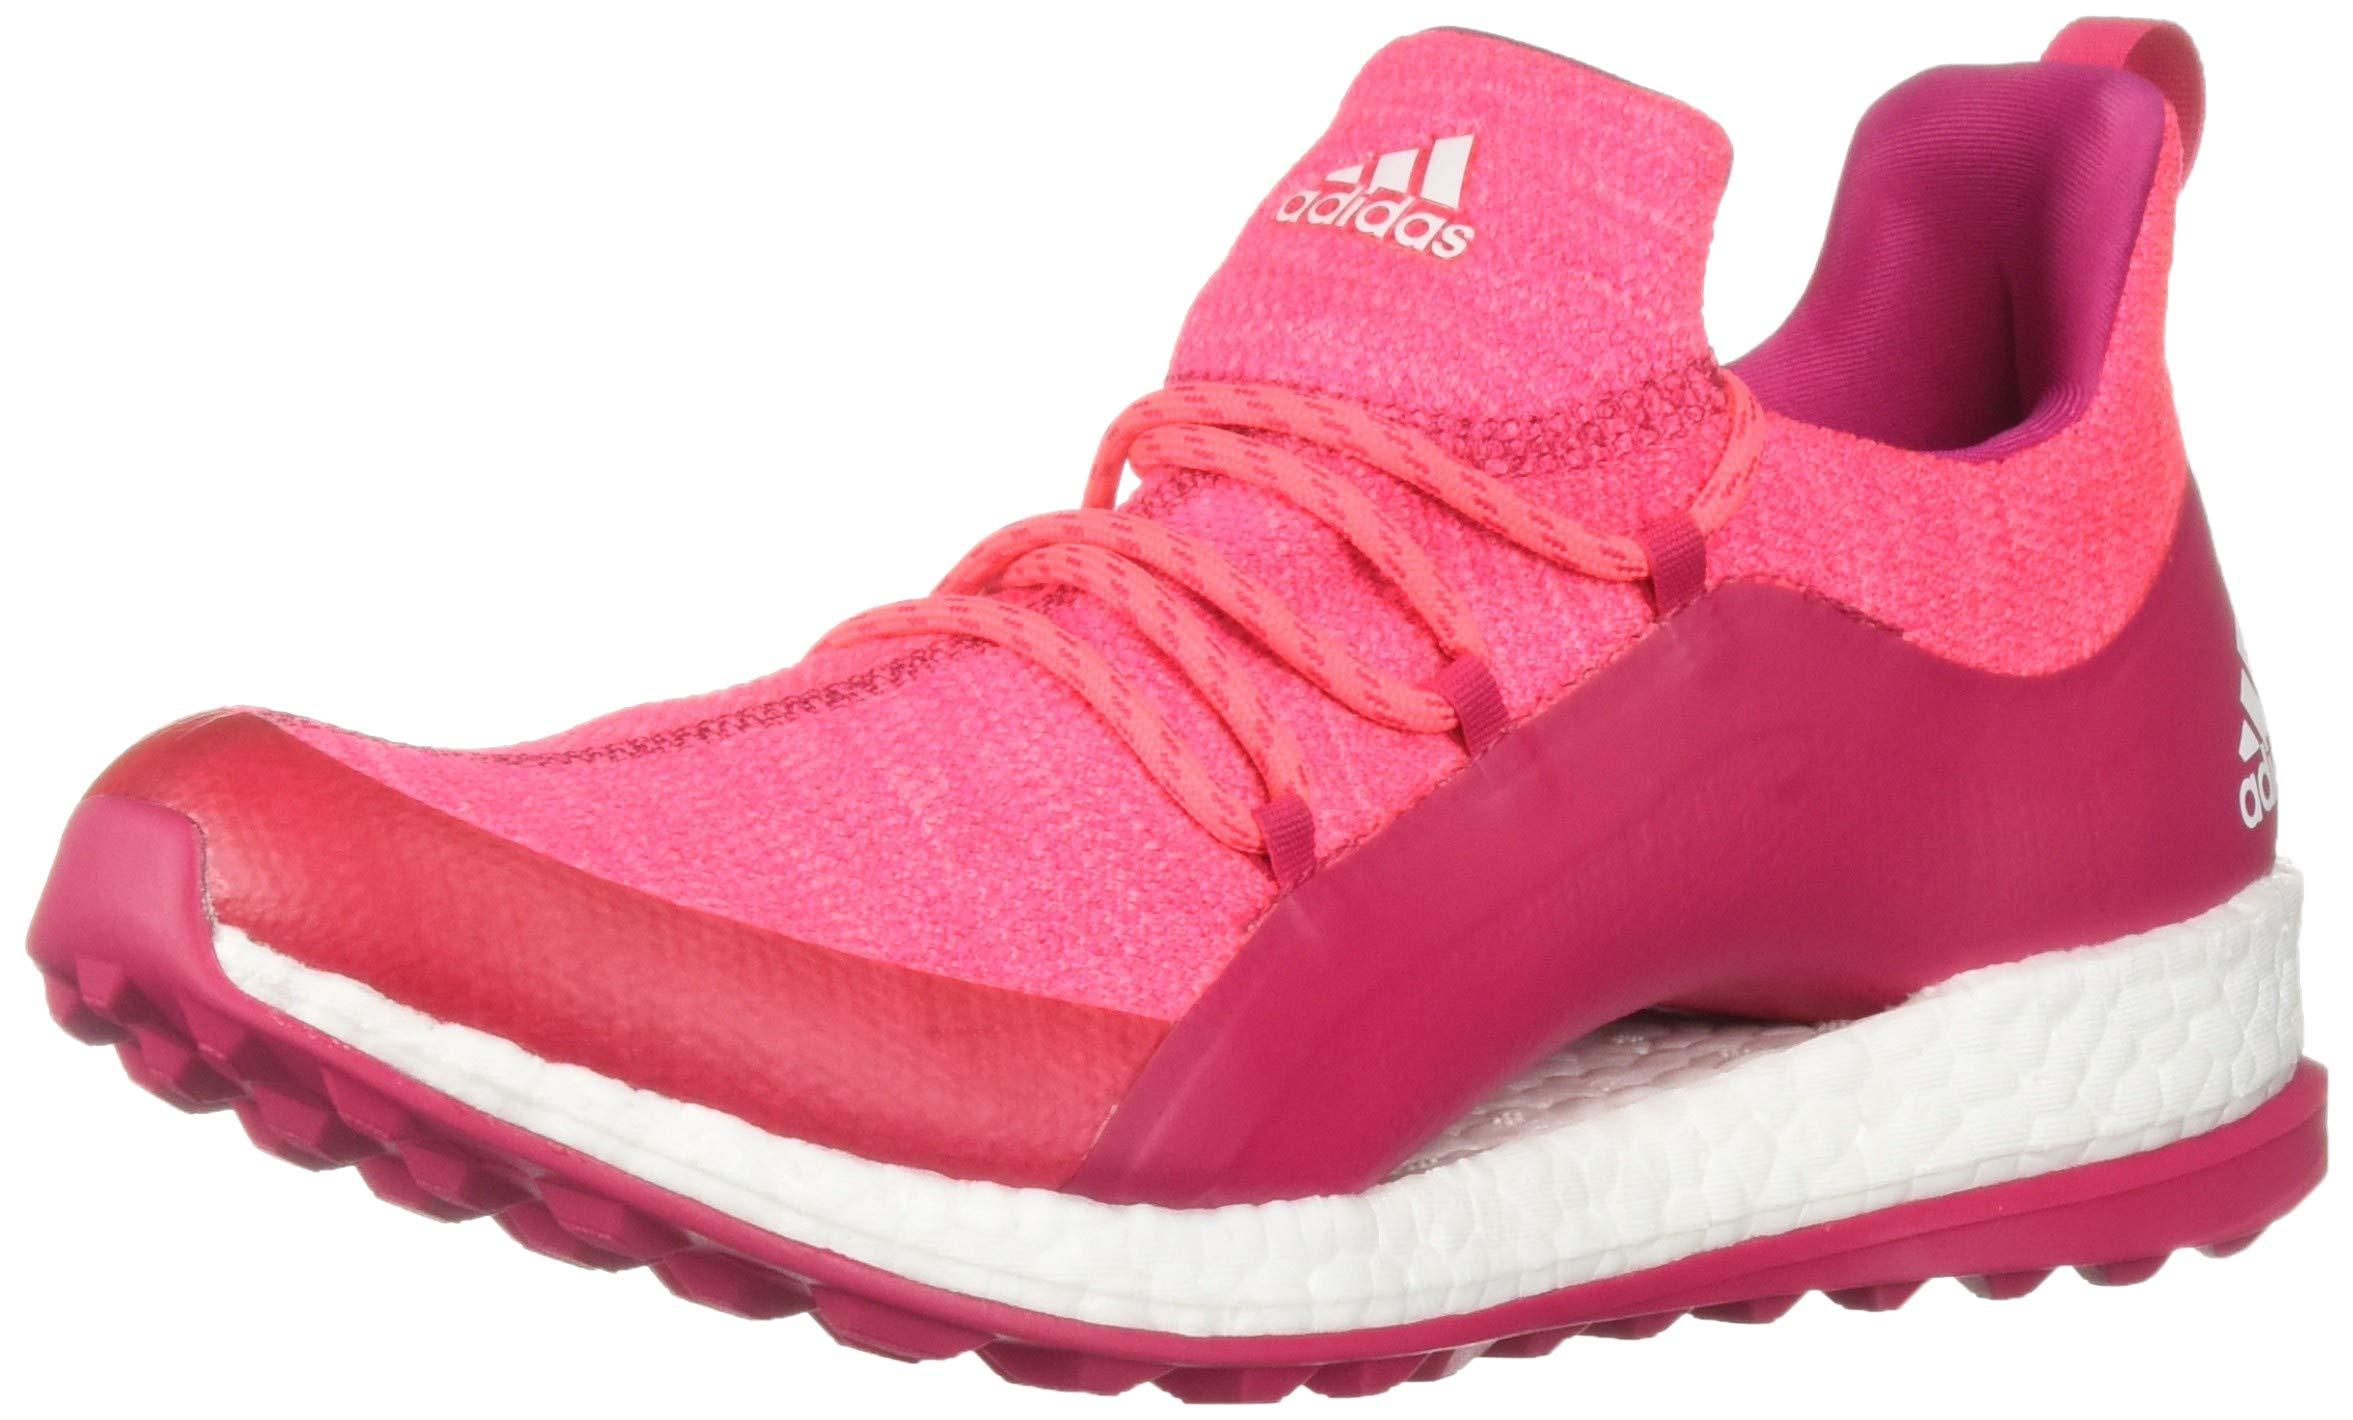 ff9375914b adidas Womens Pureboost XG 2 Golf Shoe red Zest/Active Purple/FTWR White  5.5 M US